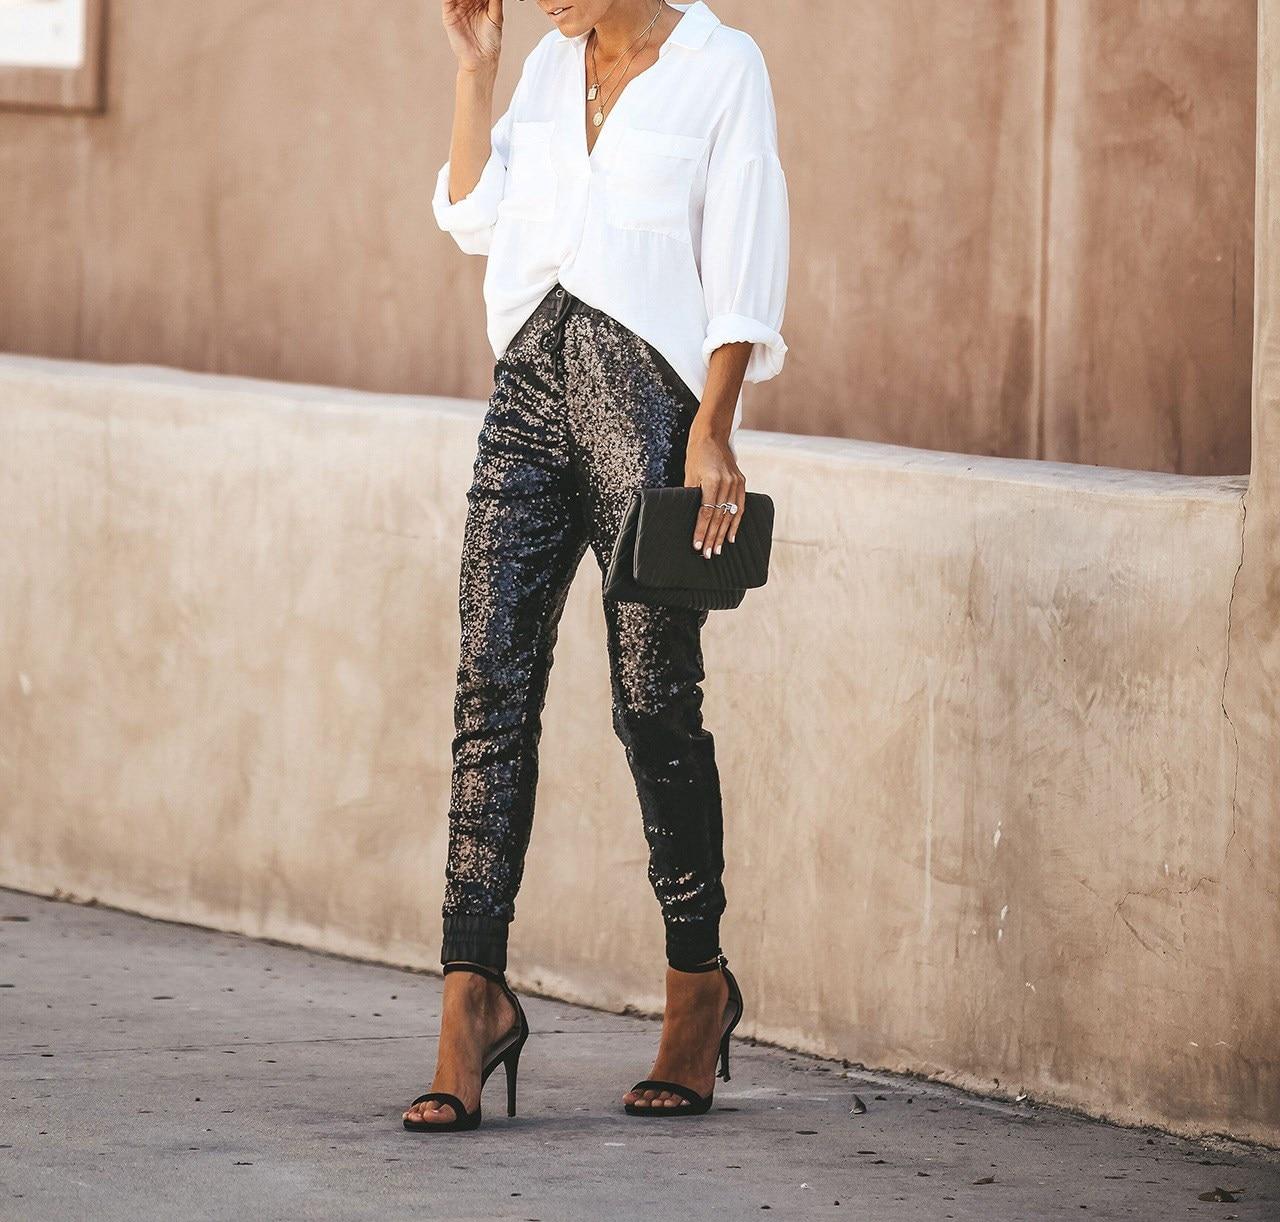 2019 Women High Waist Skinny   Pant   Sequins Glitter Leggings Joggings Trousers Clubwear